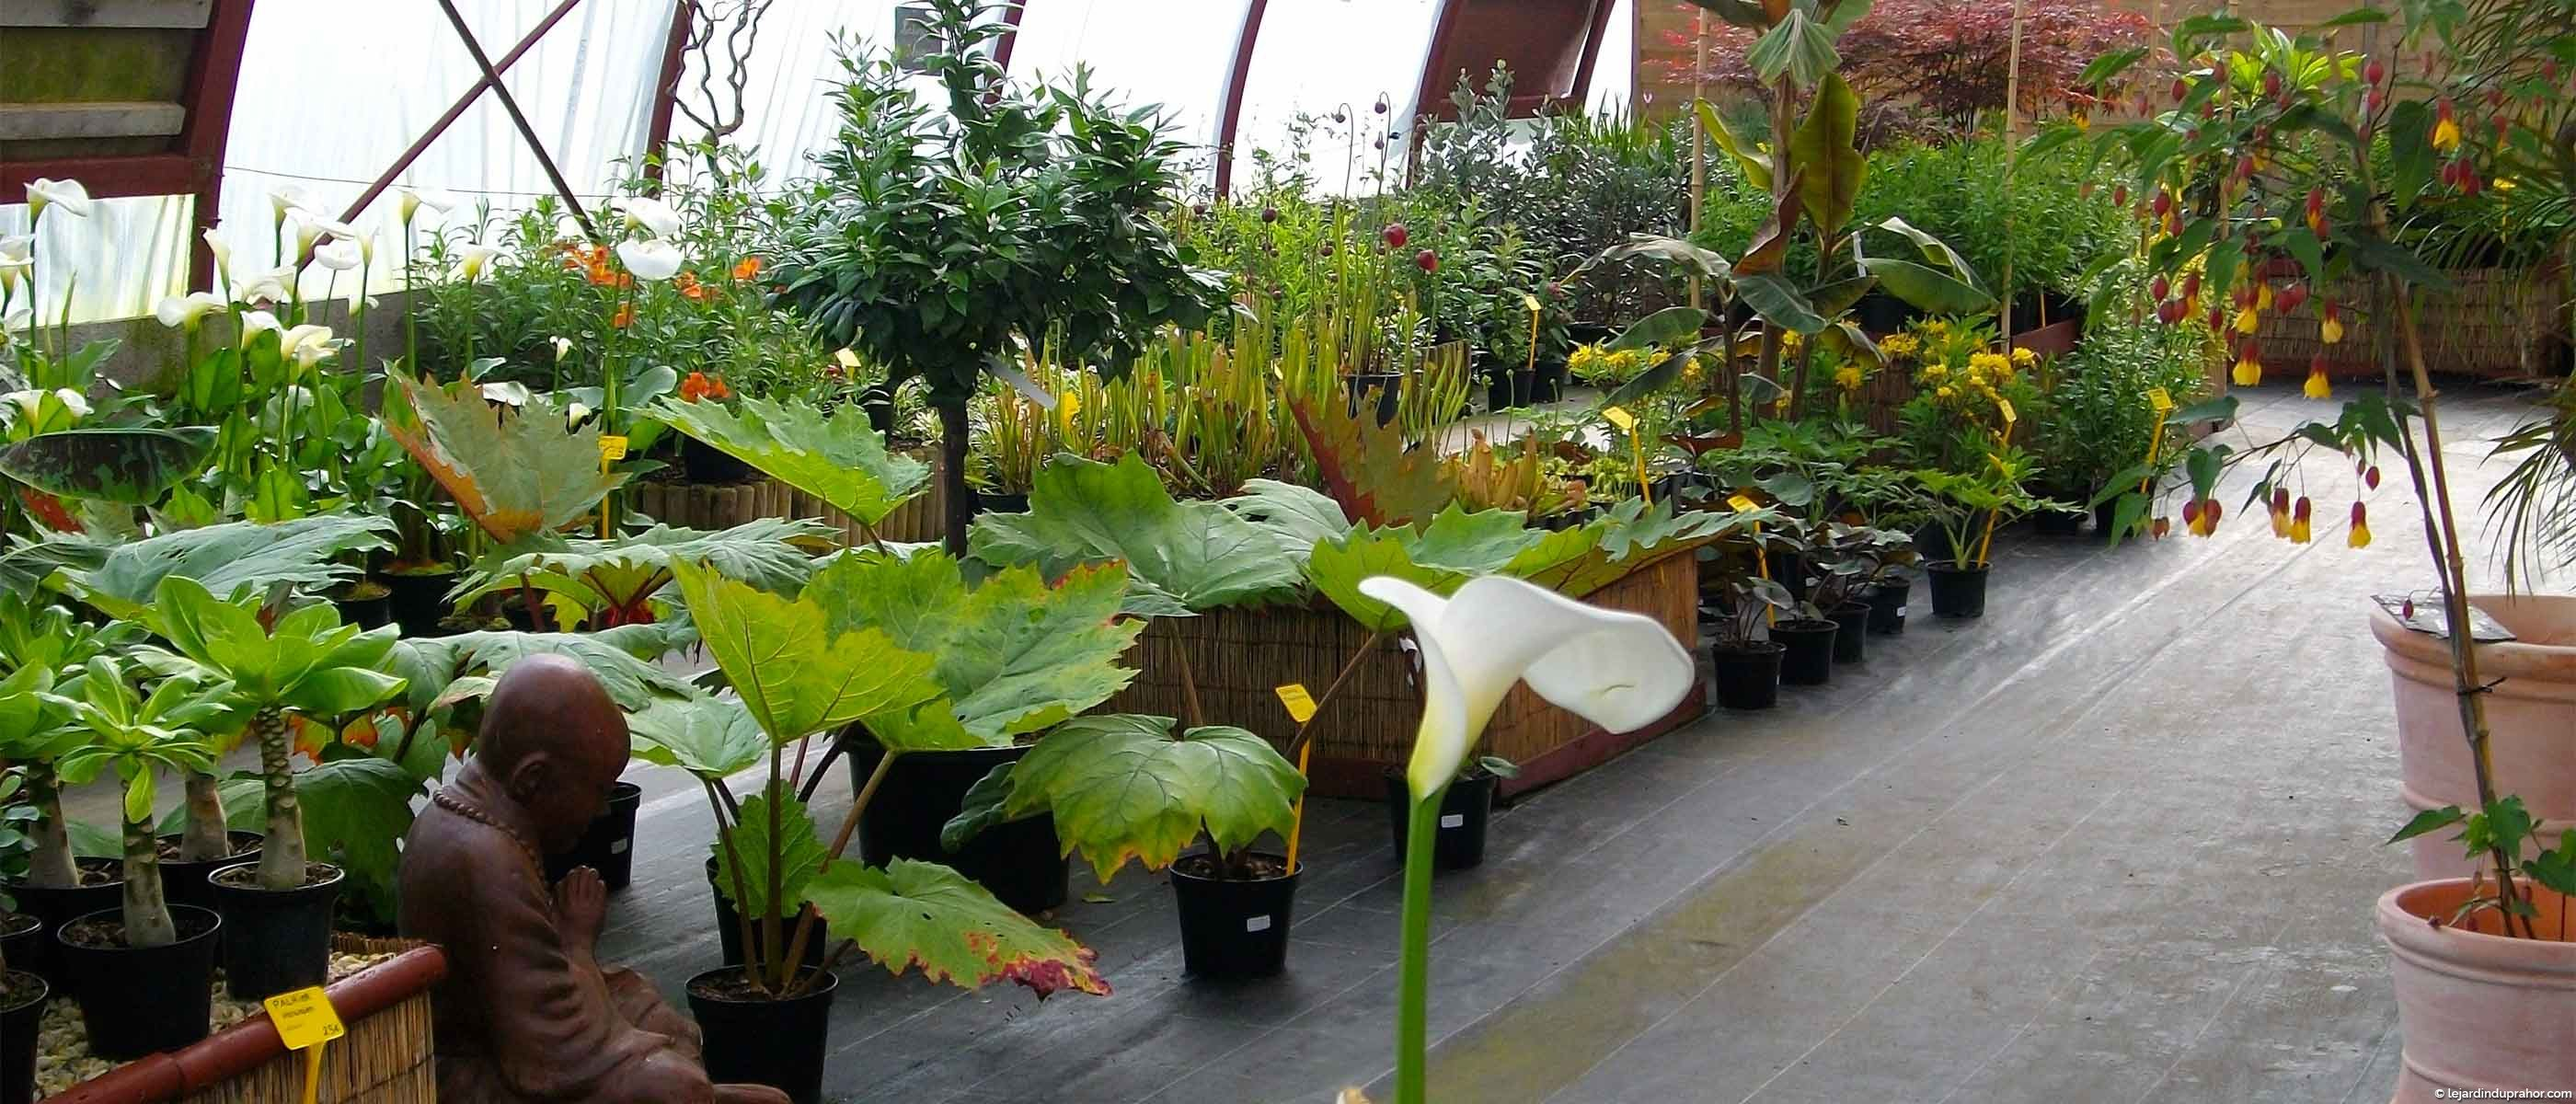 Rhubarbe g ante et arum g ant le jardin du prahor for Graminee geante